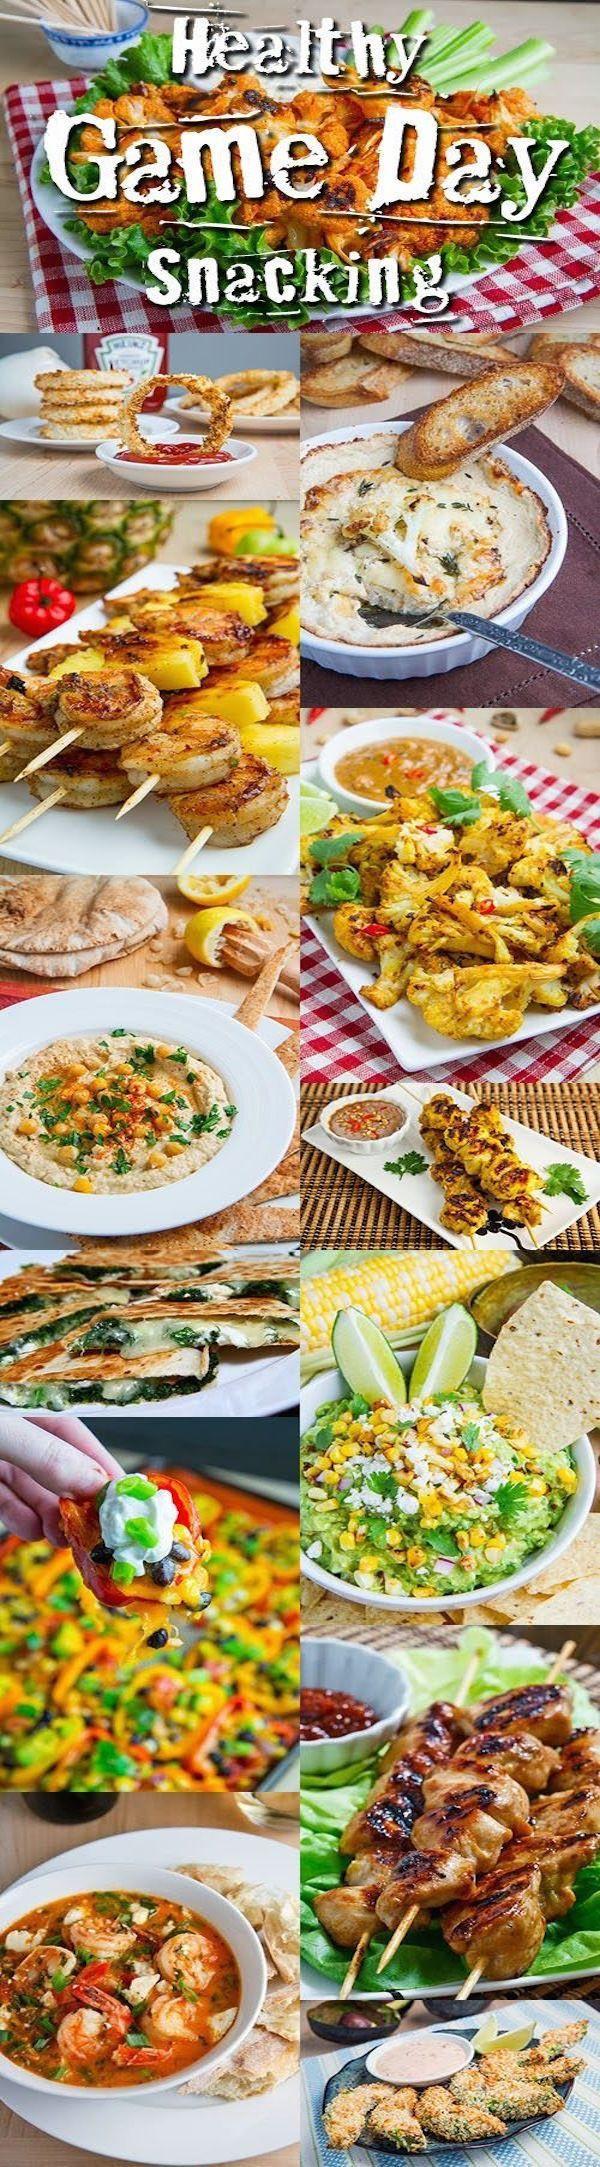 Healthy Game Day Snacks  Healthy Game Day Snacks – Edible Crafts